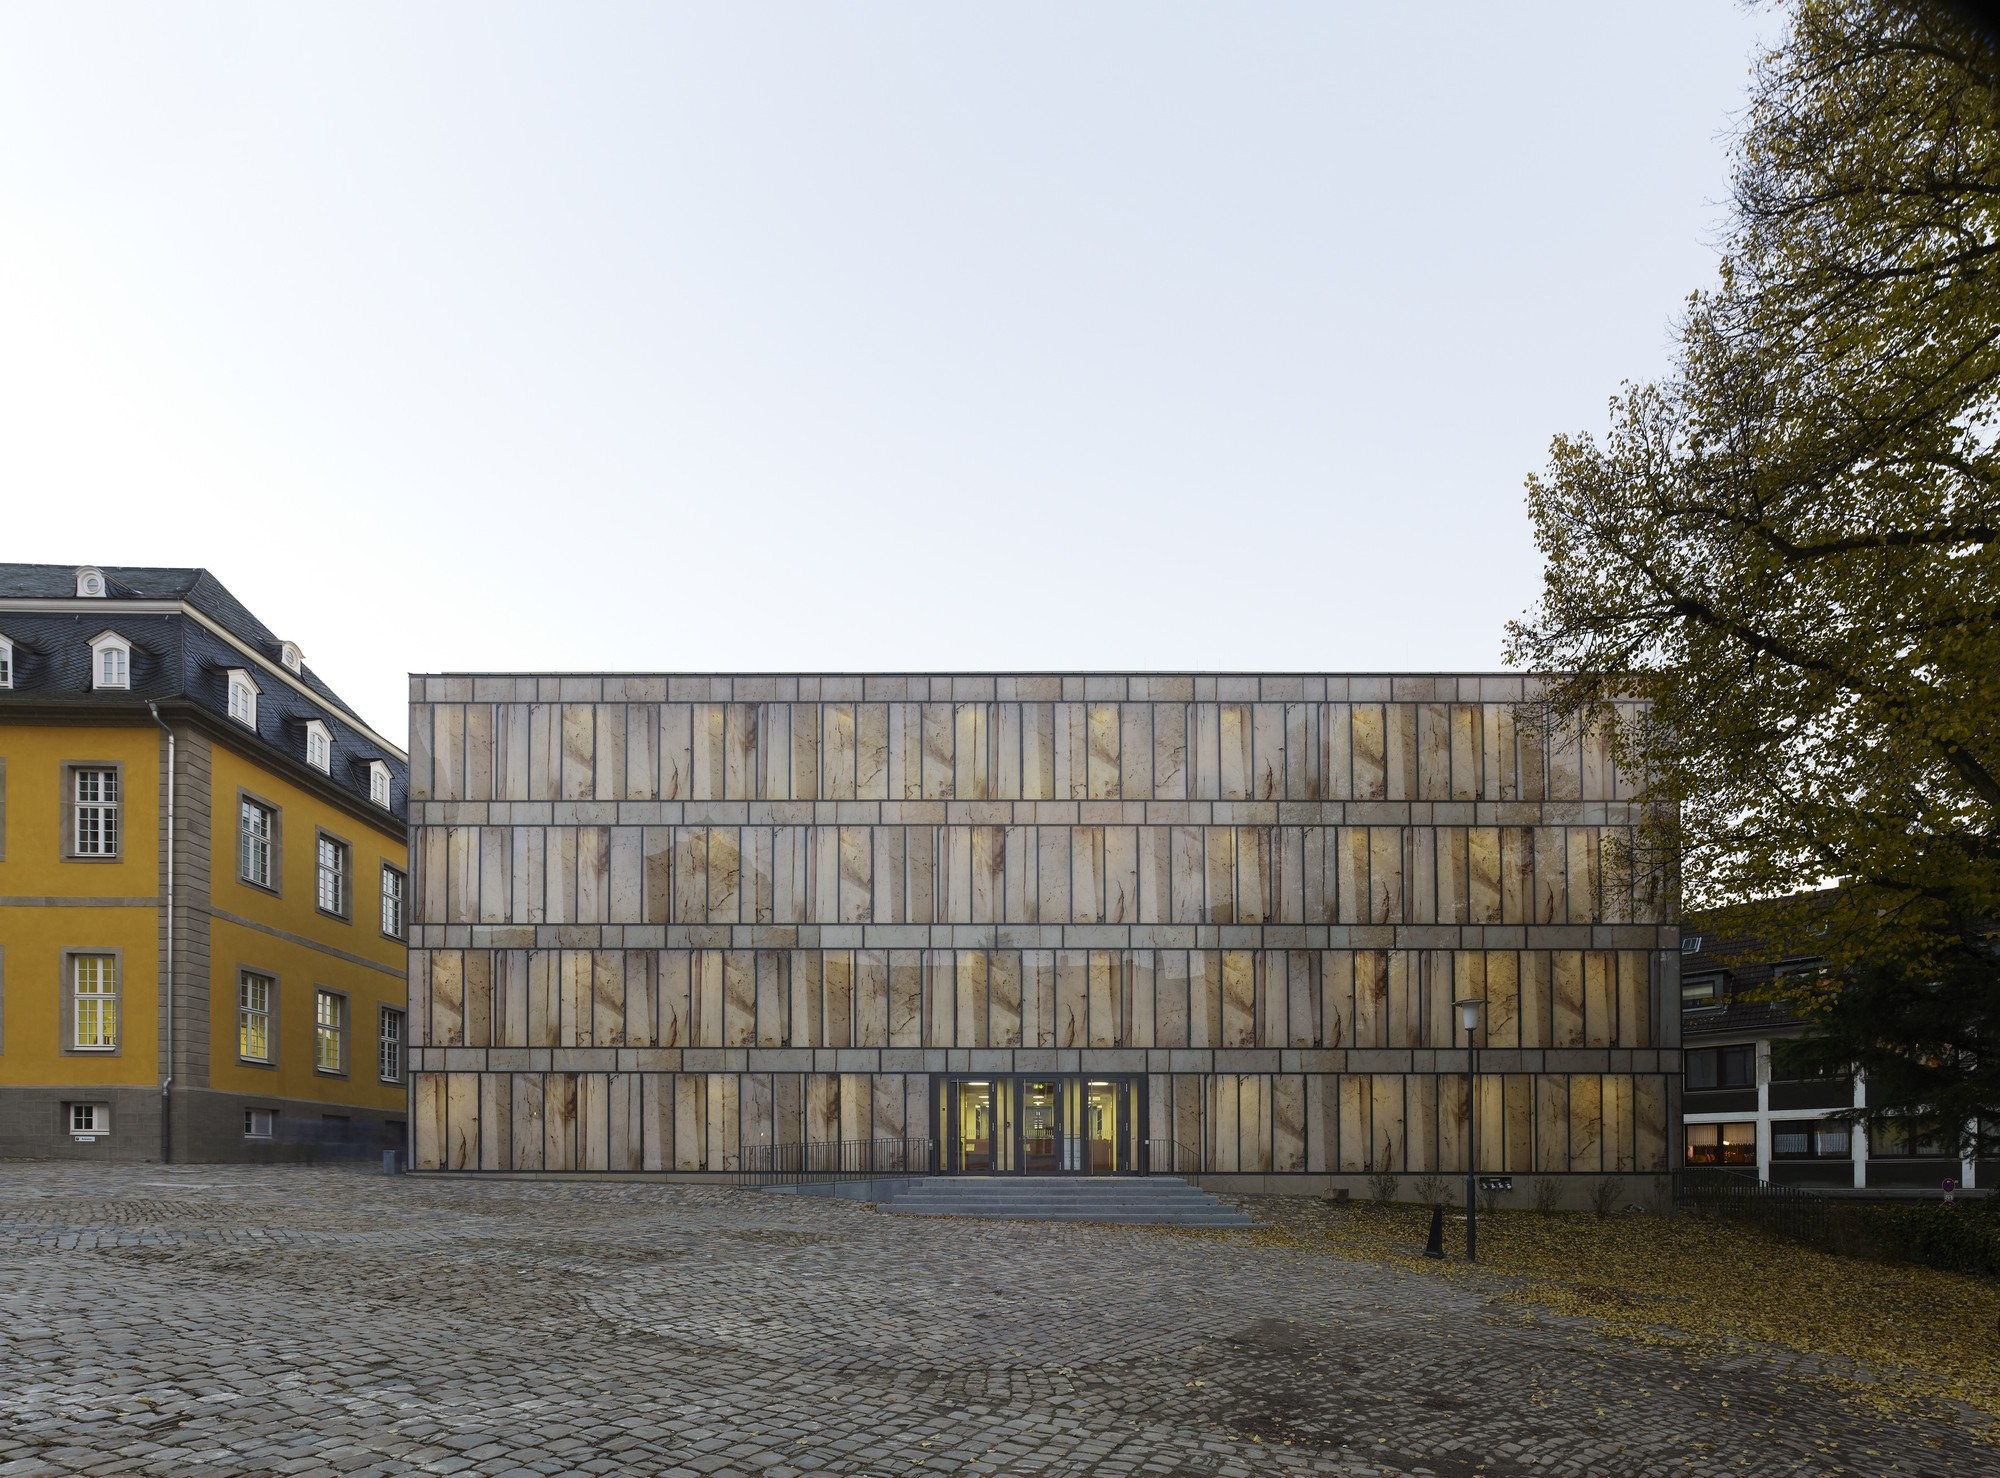 Folkwang Library / Max Dudler